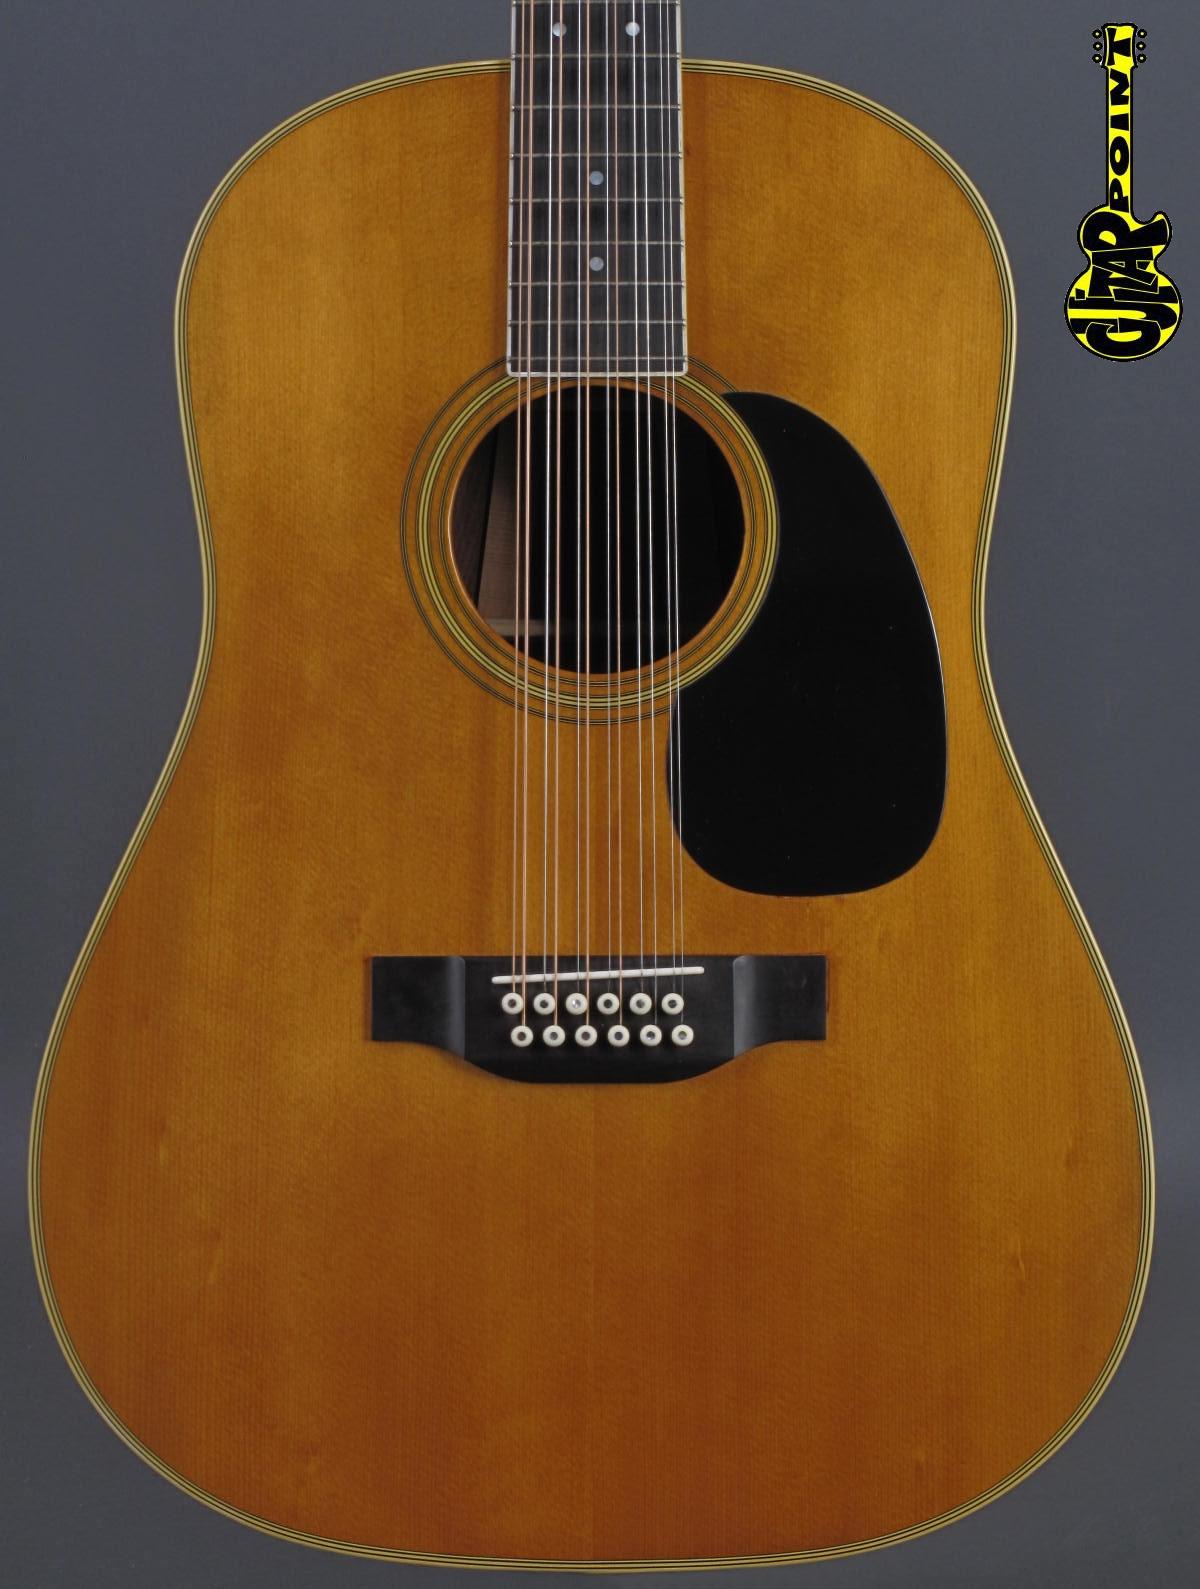 1970 Martin D 12-35 - Natural  / 12-string